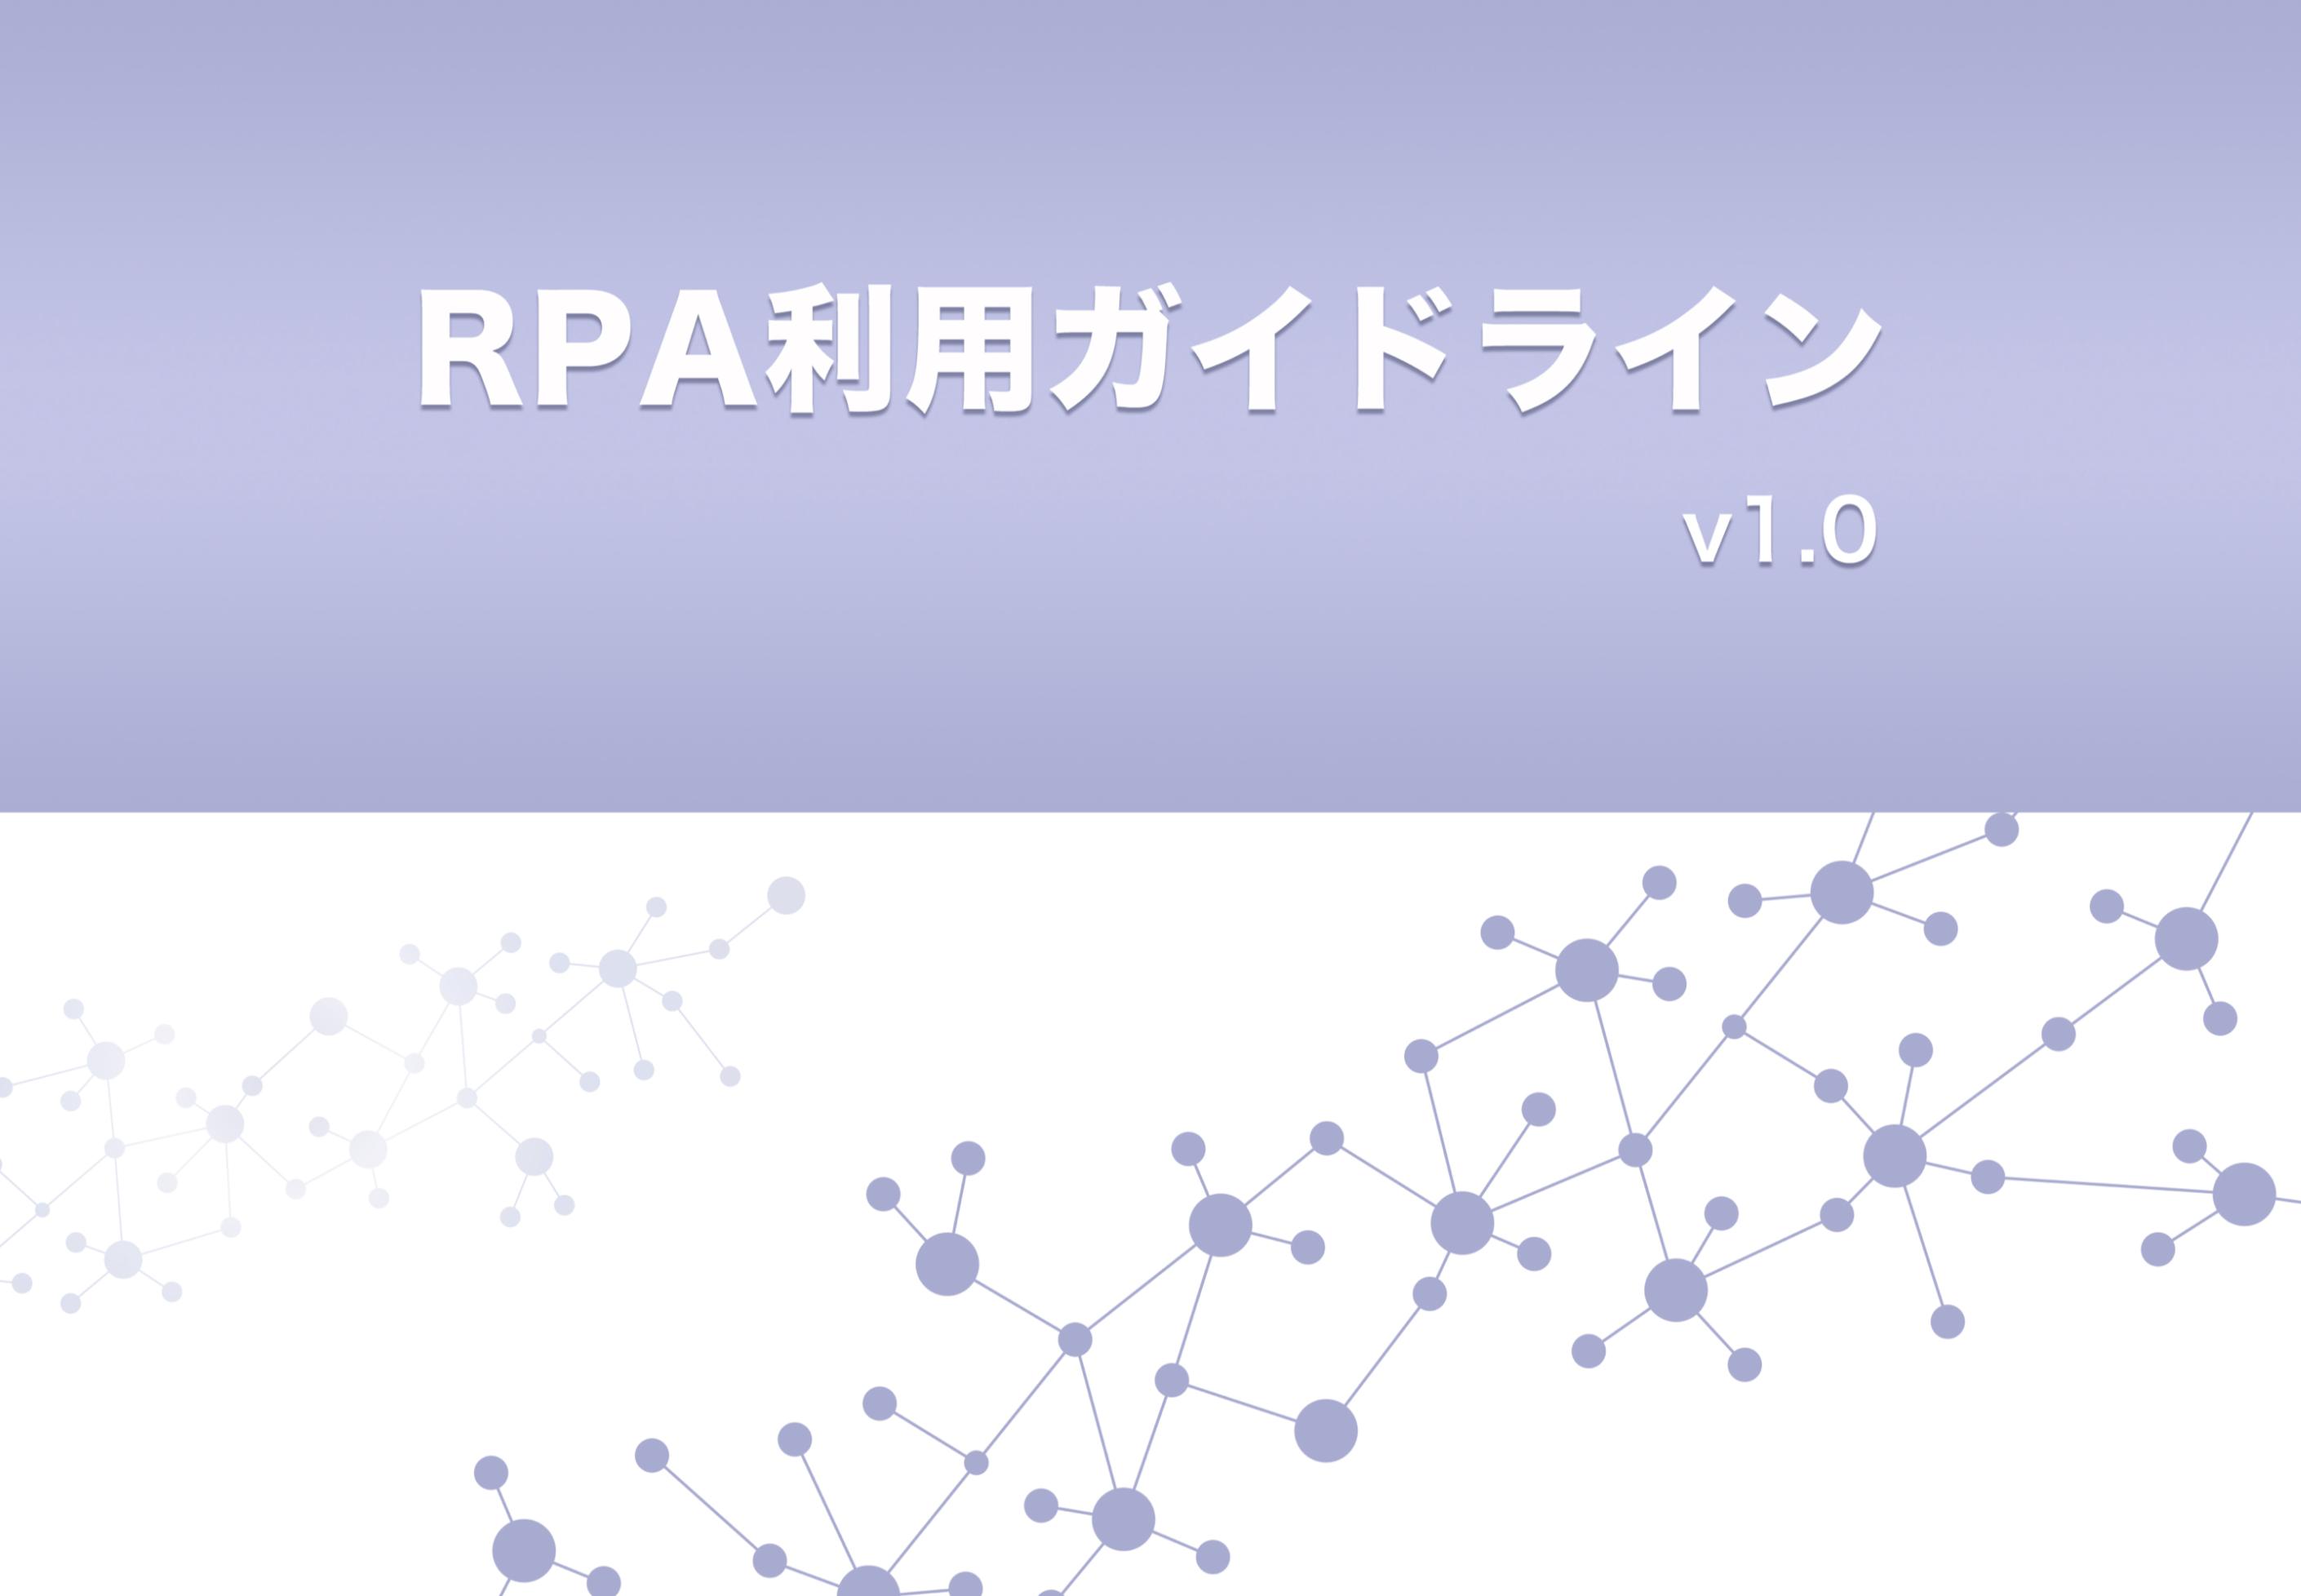 RPA導入した企業の役に立つRPA利用ガイドライン